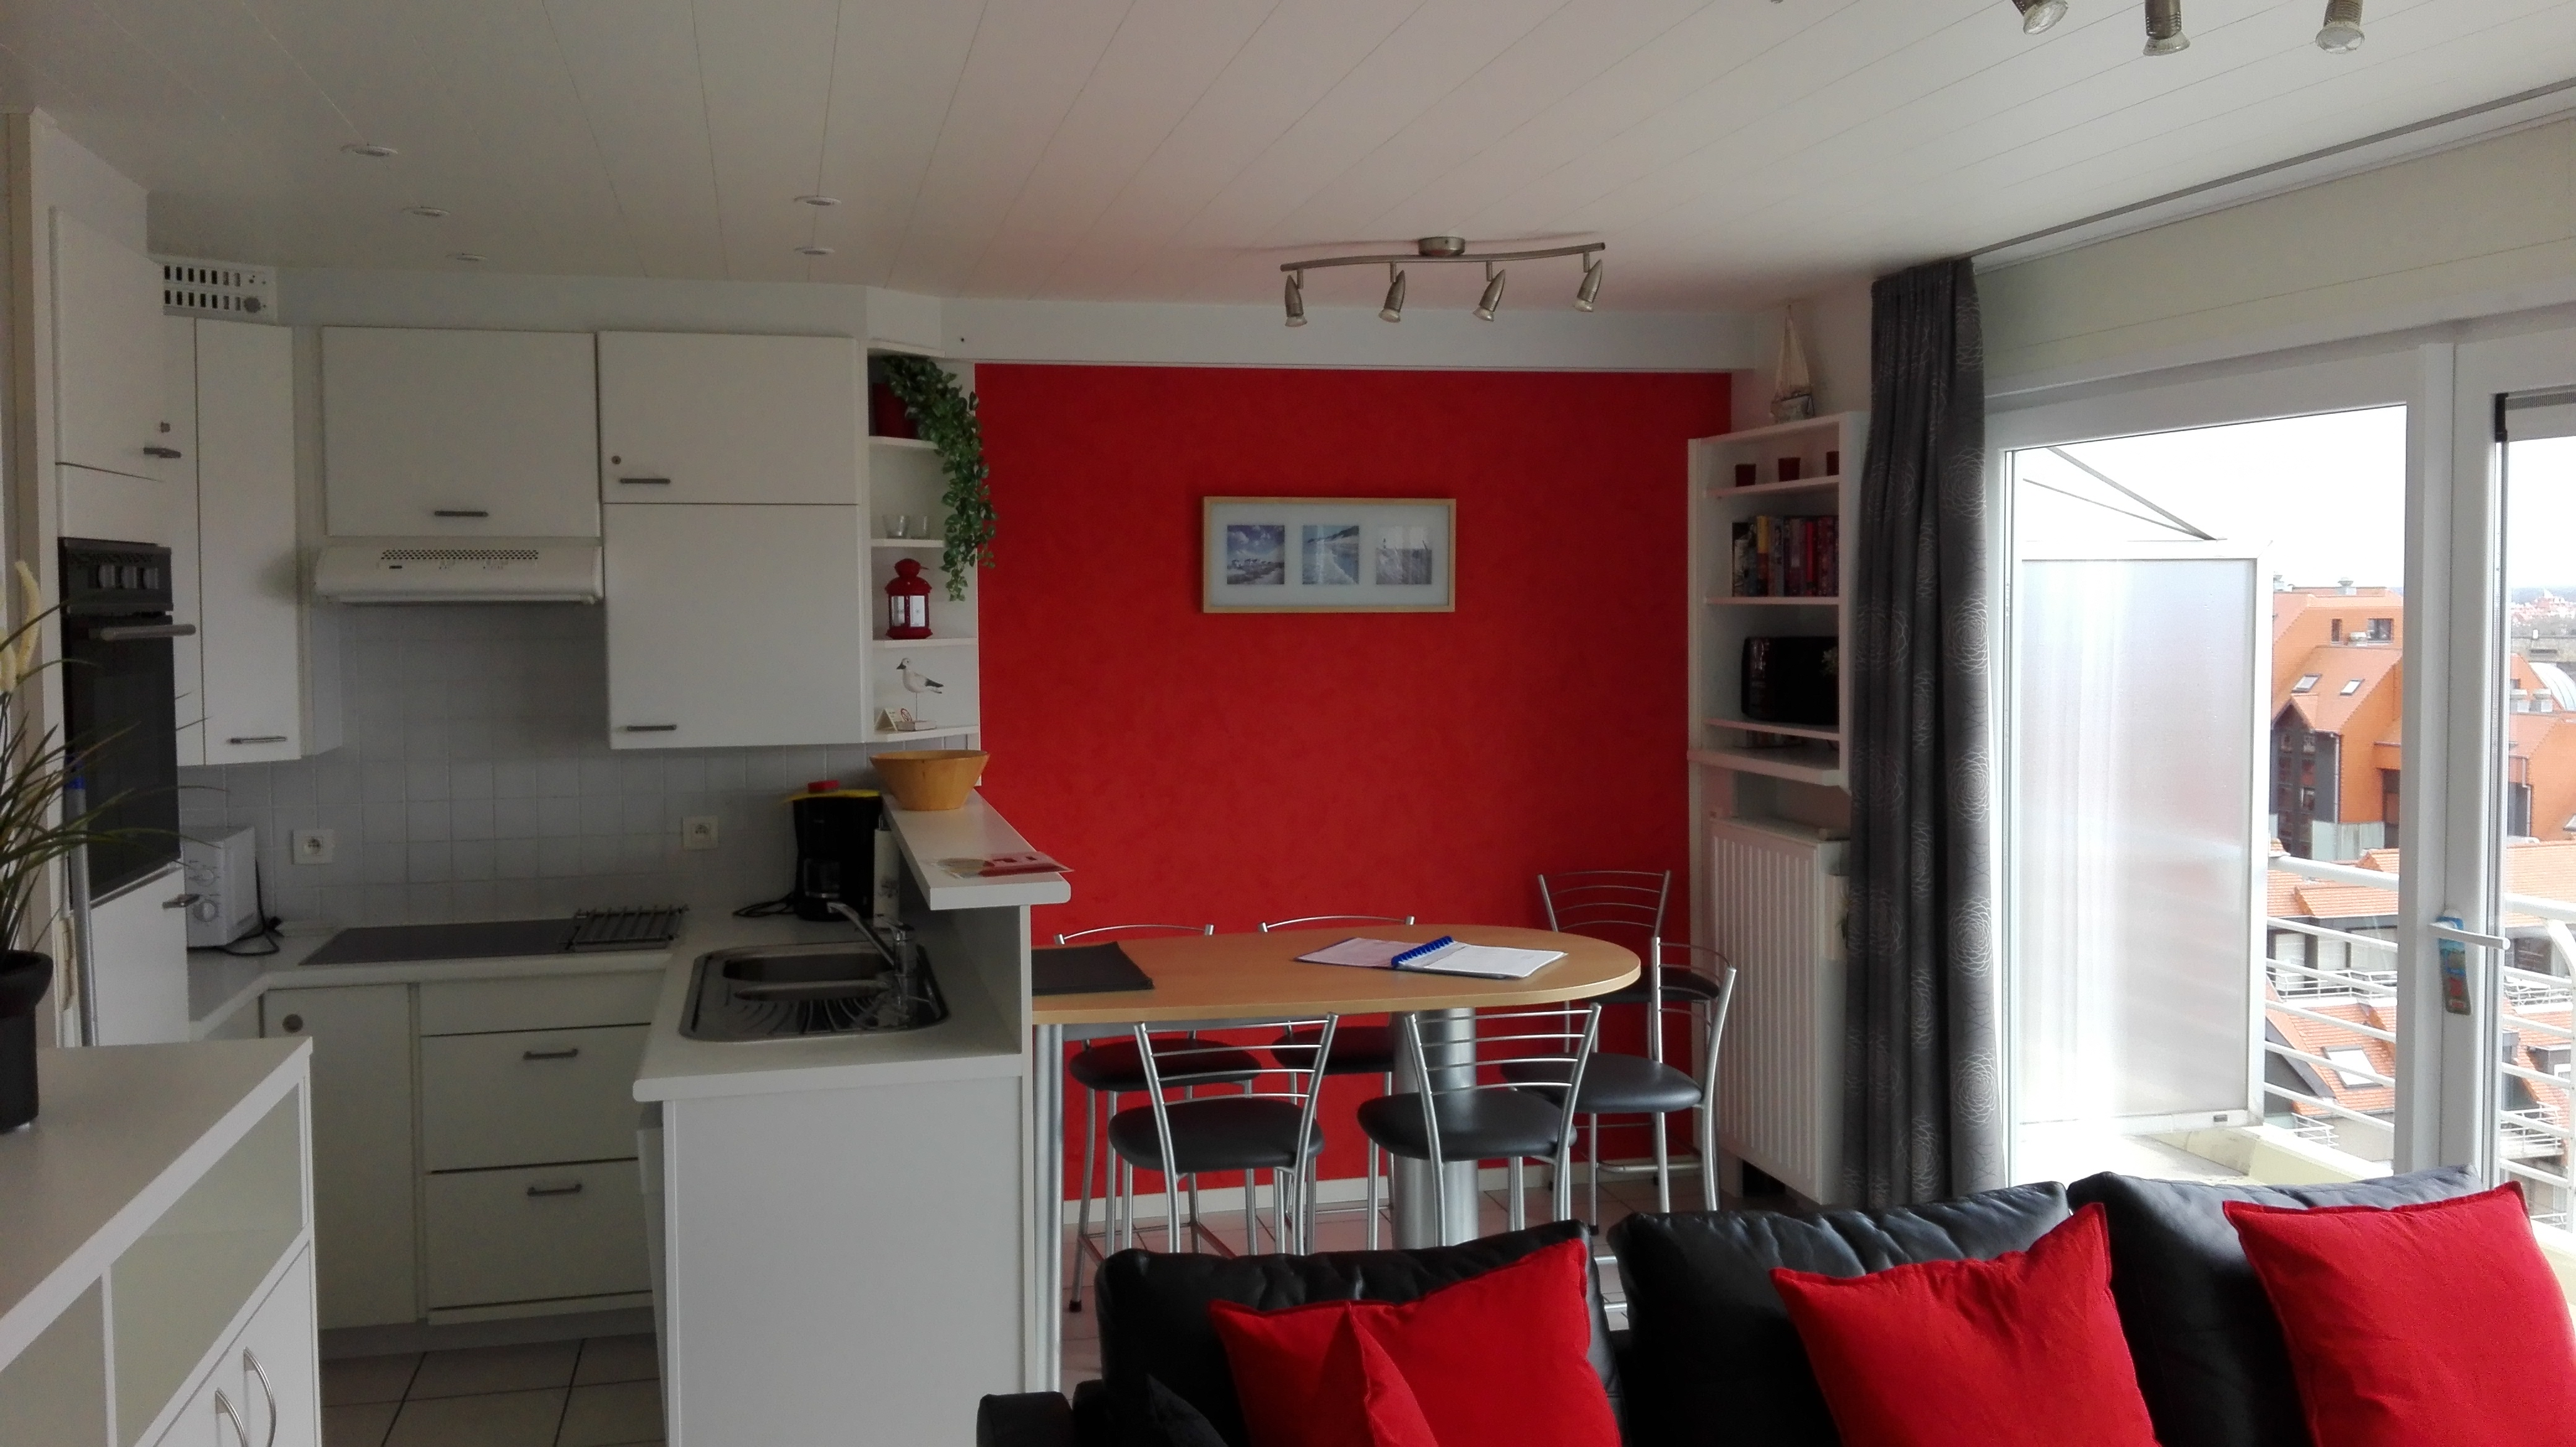 Nieuwpoort - Apt 2 Slpkmrs/Chambres - Residentie Wielingerbank F